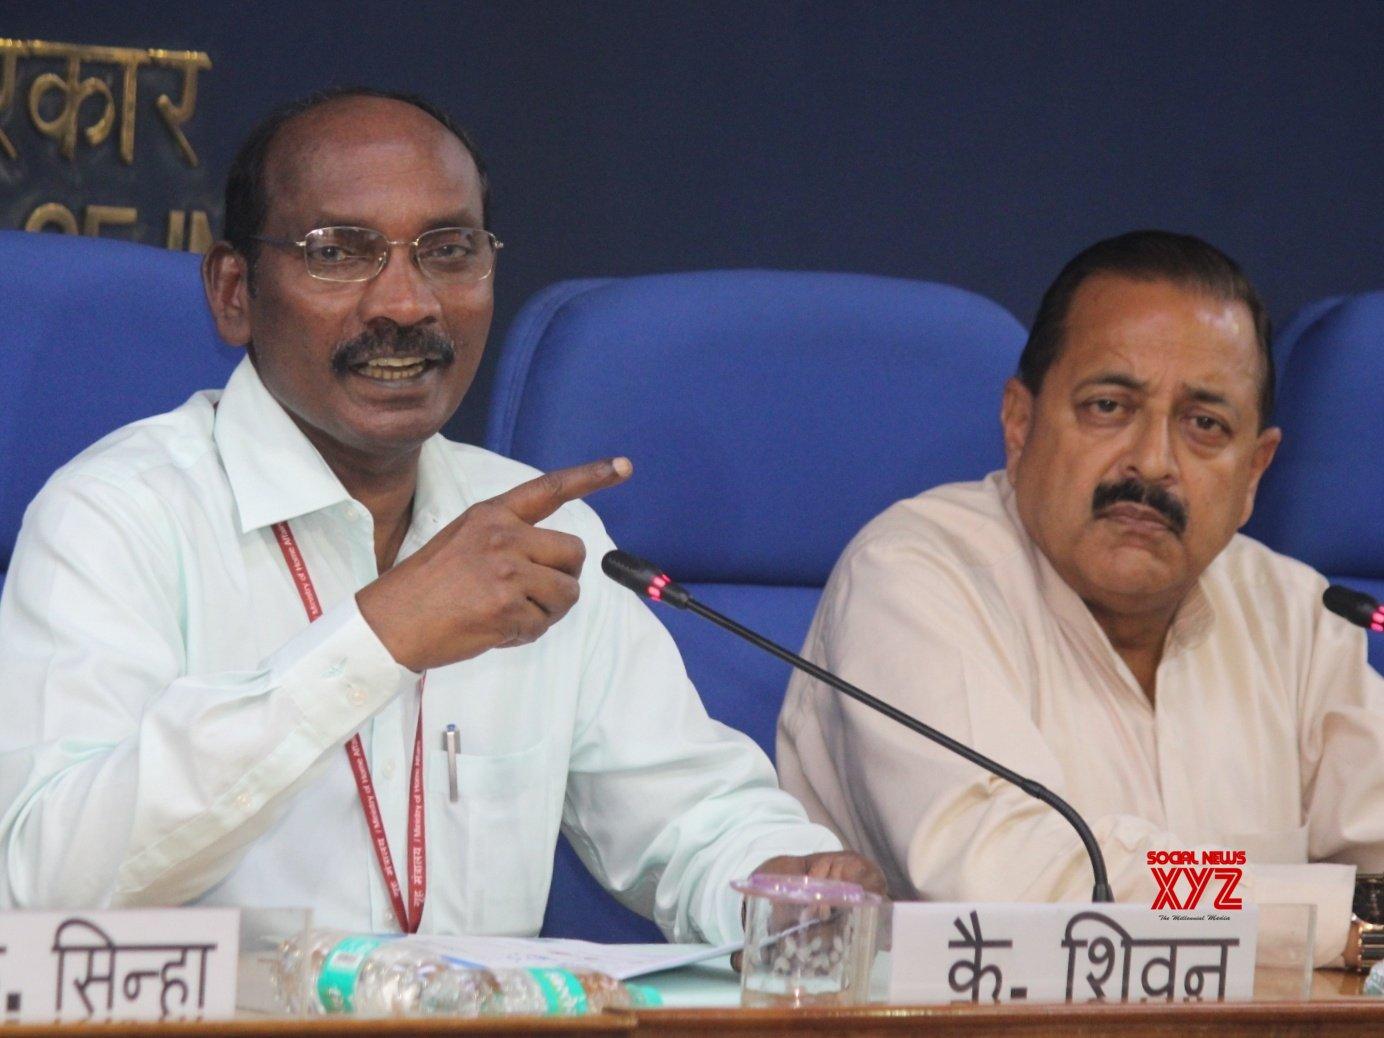 New Delhi: K. Sivan, Jitendra Singh's press conference #Gallery